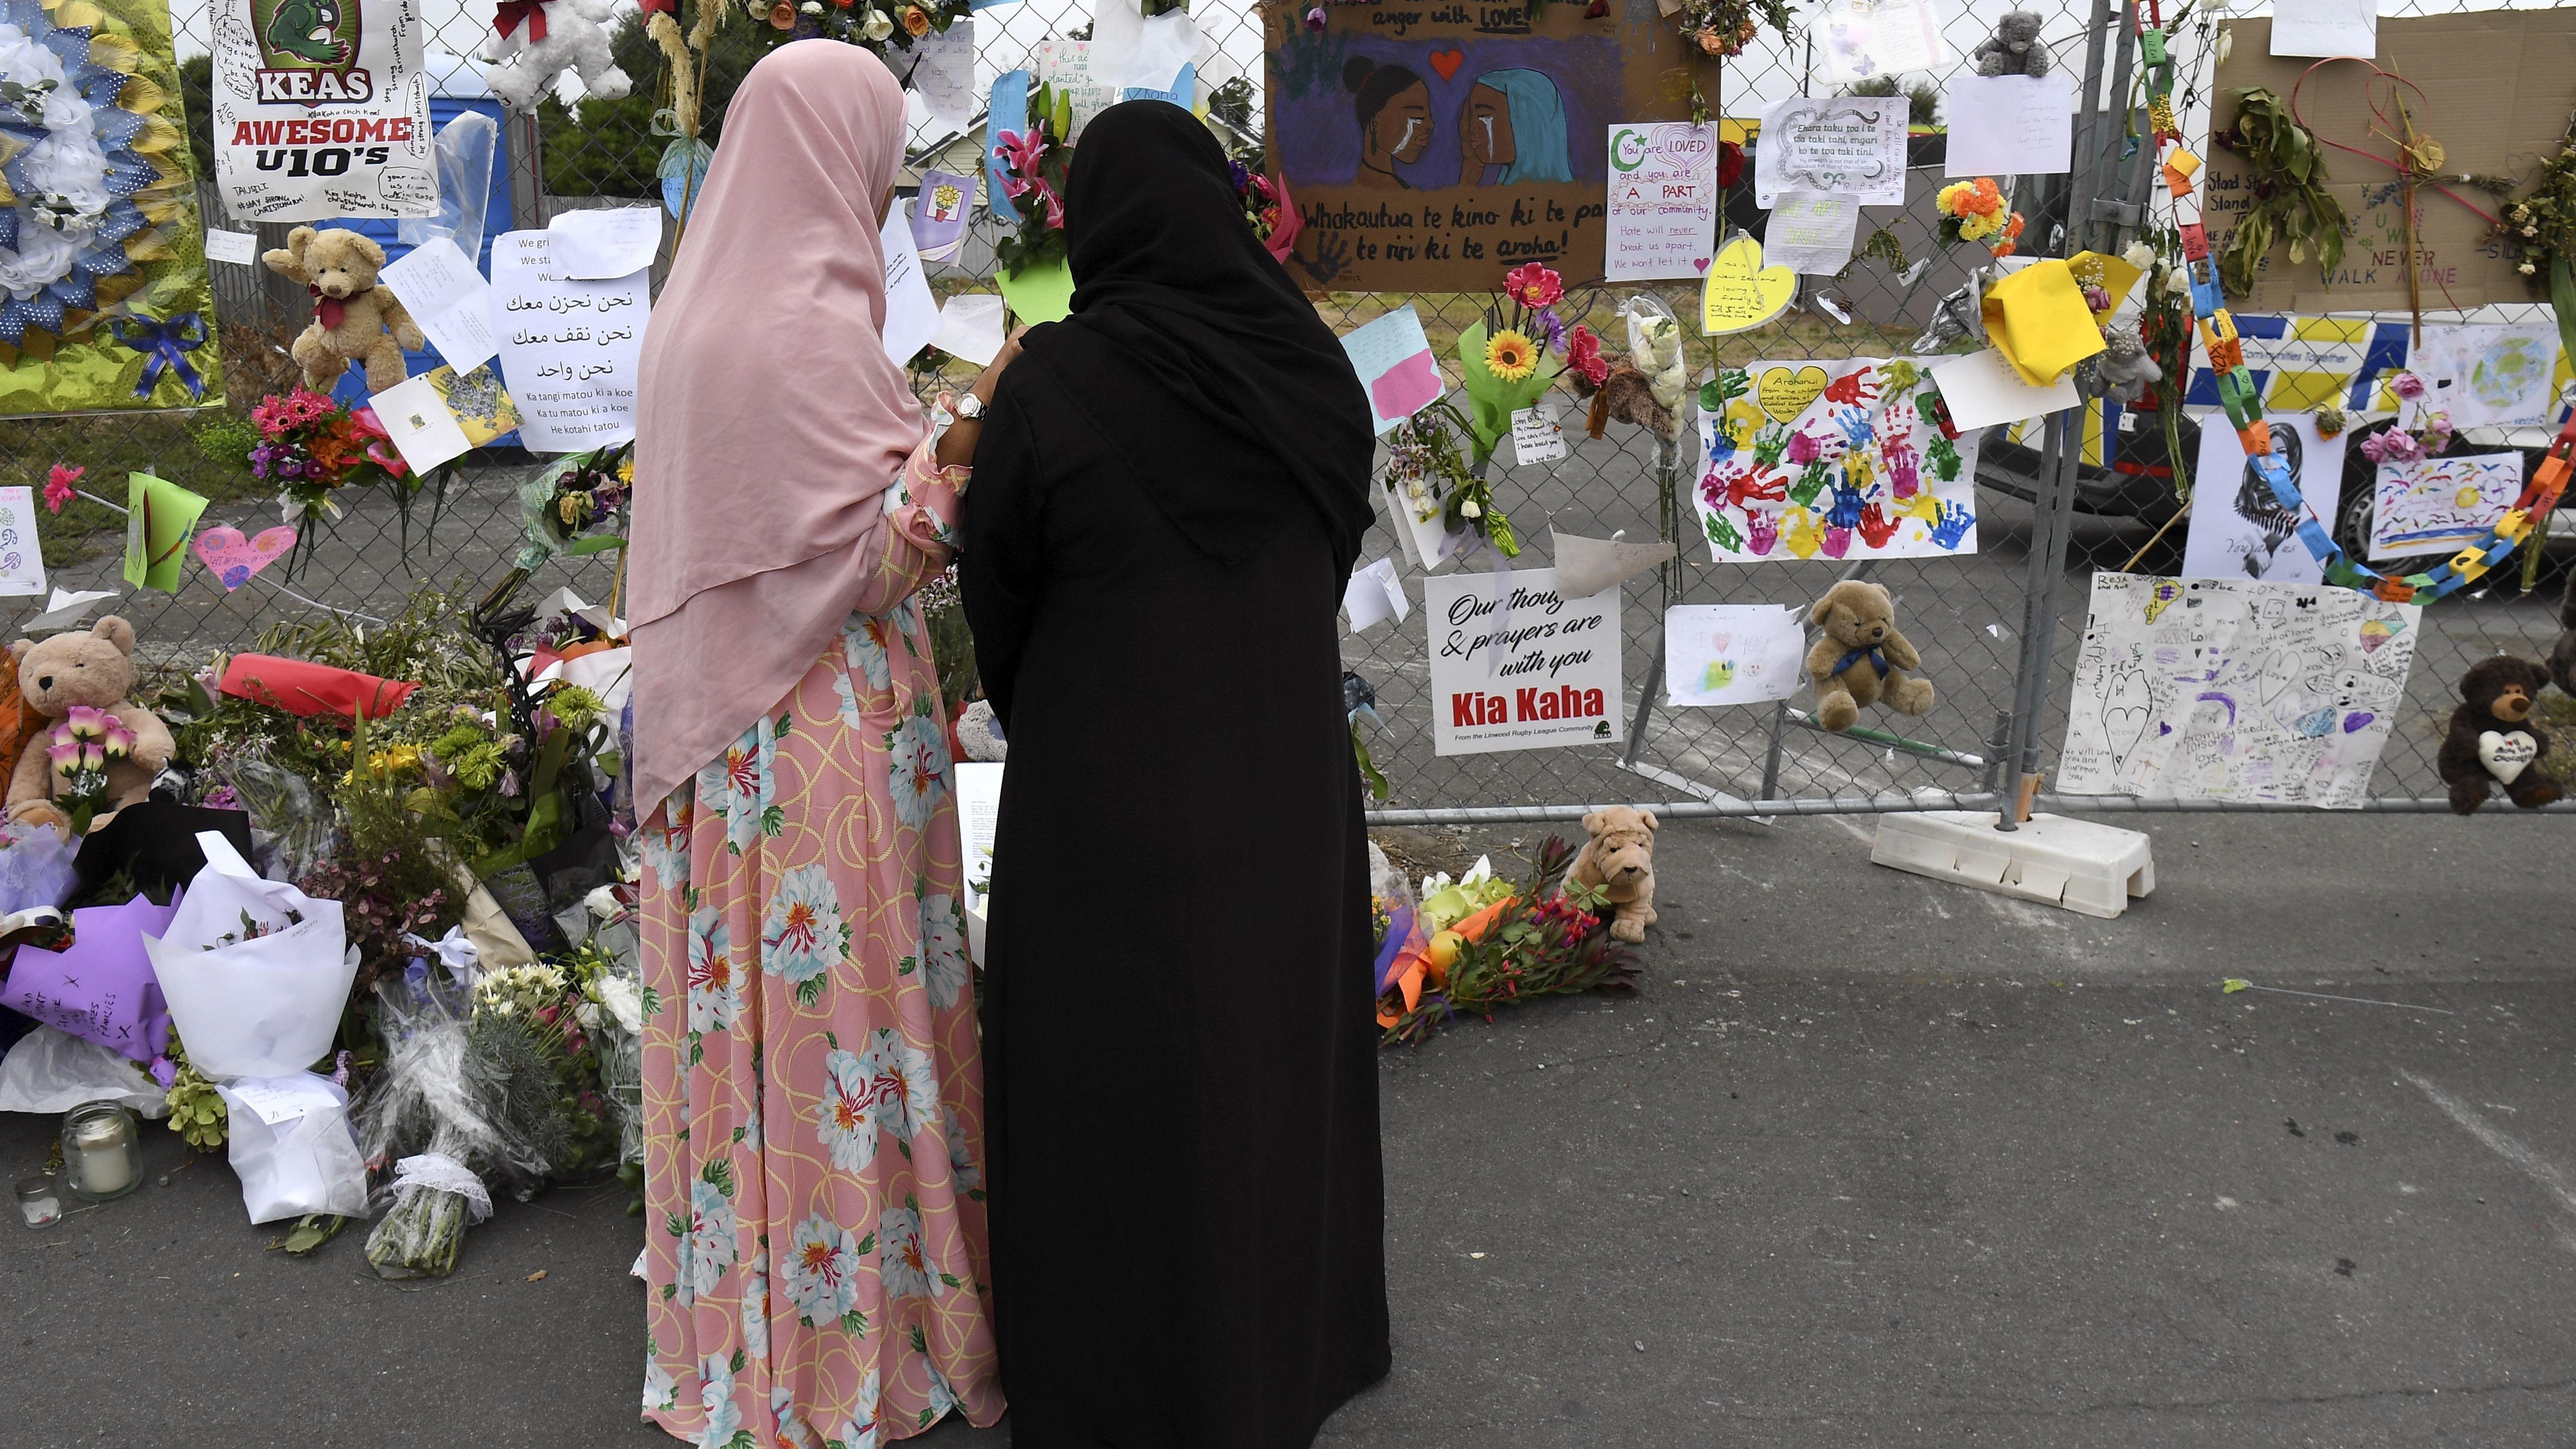 Author Says New Zealand Massacre Points To A Global Resurgence Of 'Extremism'